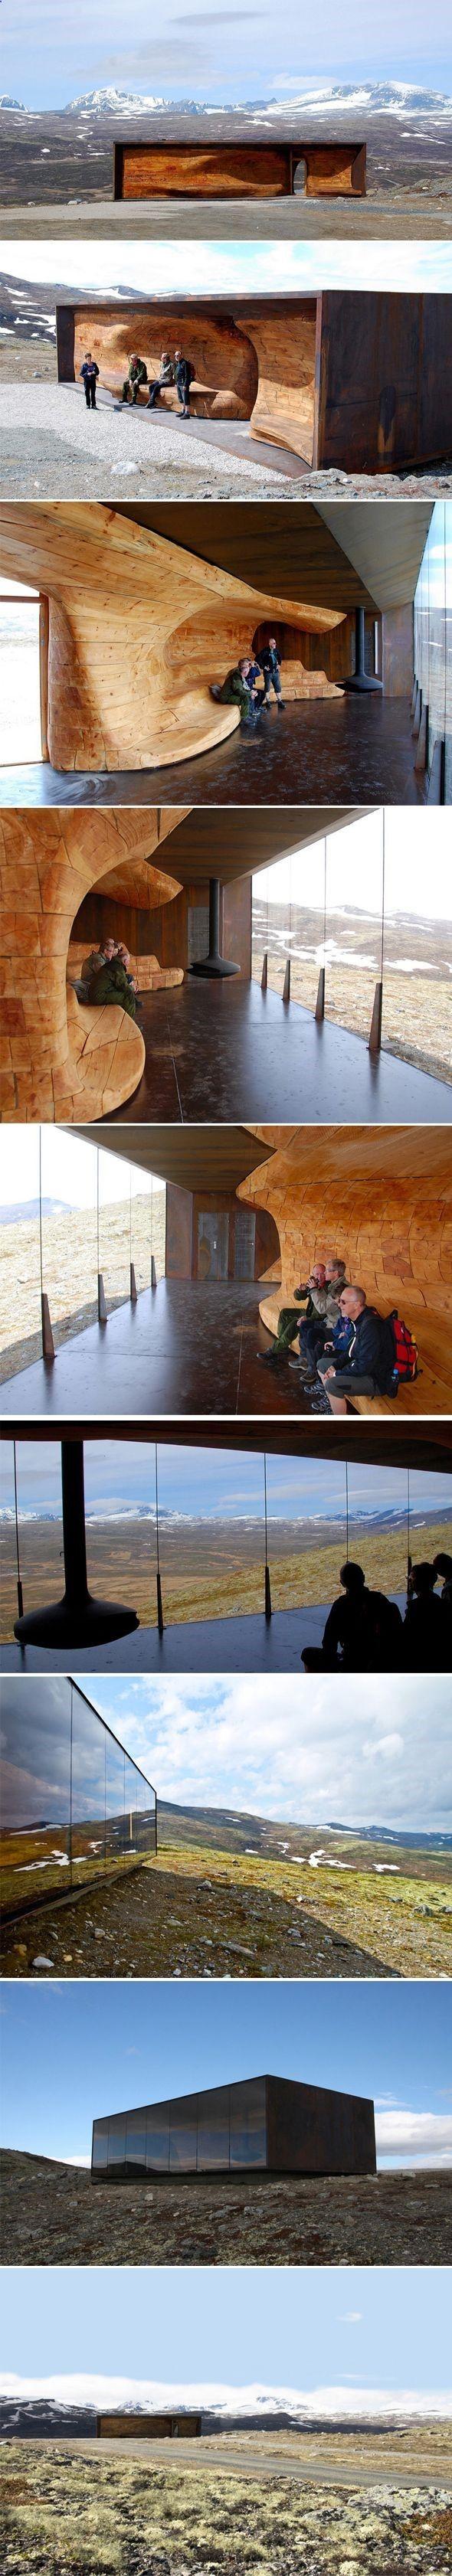 Home park design bilder container house  norwegianwildreindeercentrepavilionsnohetta